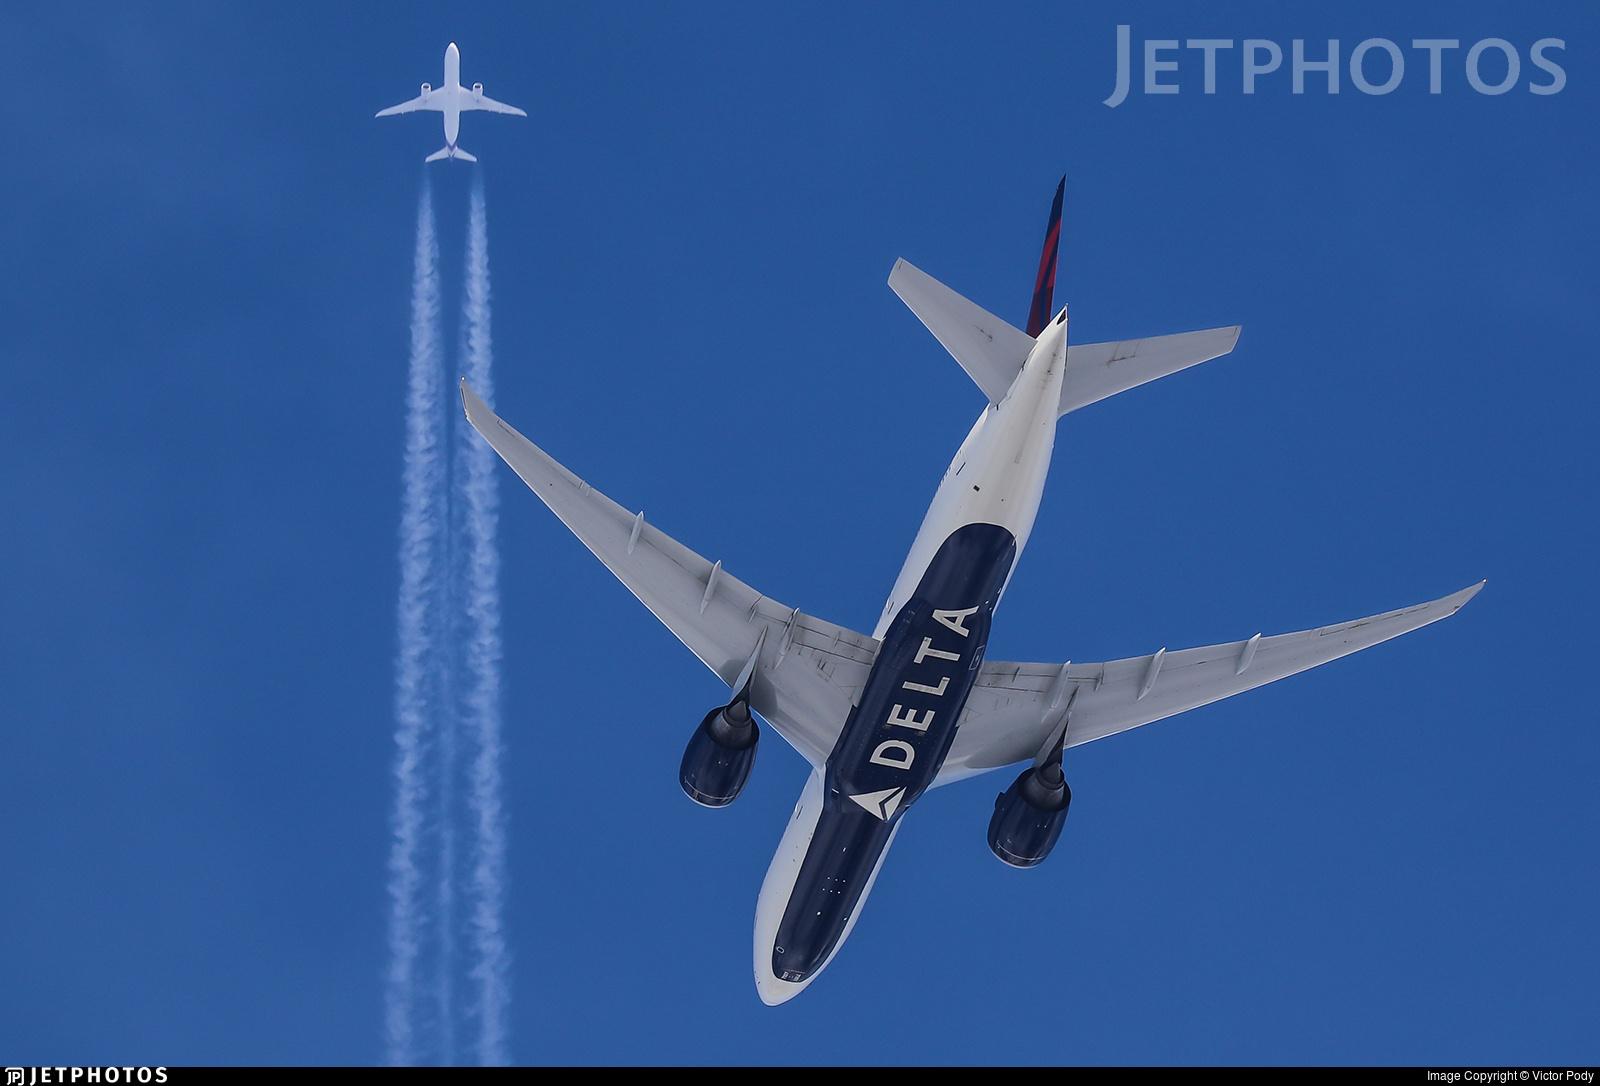 A Thai Airways 787 passes high above a Delta 777 landing in Sydney